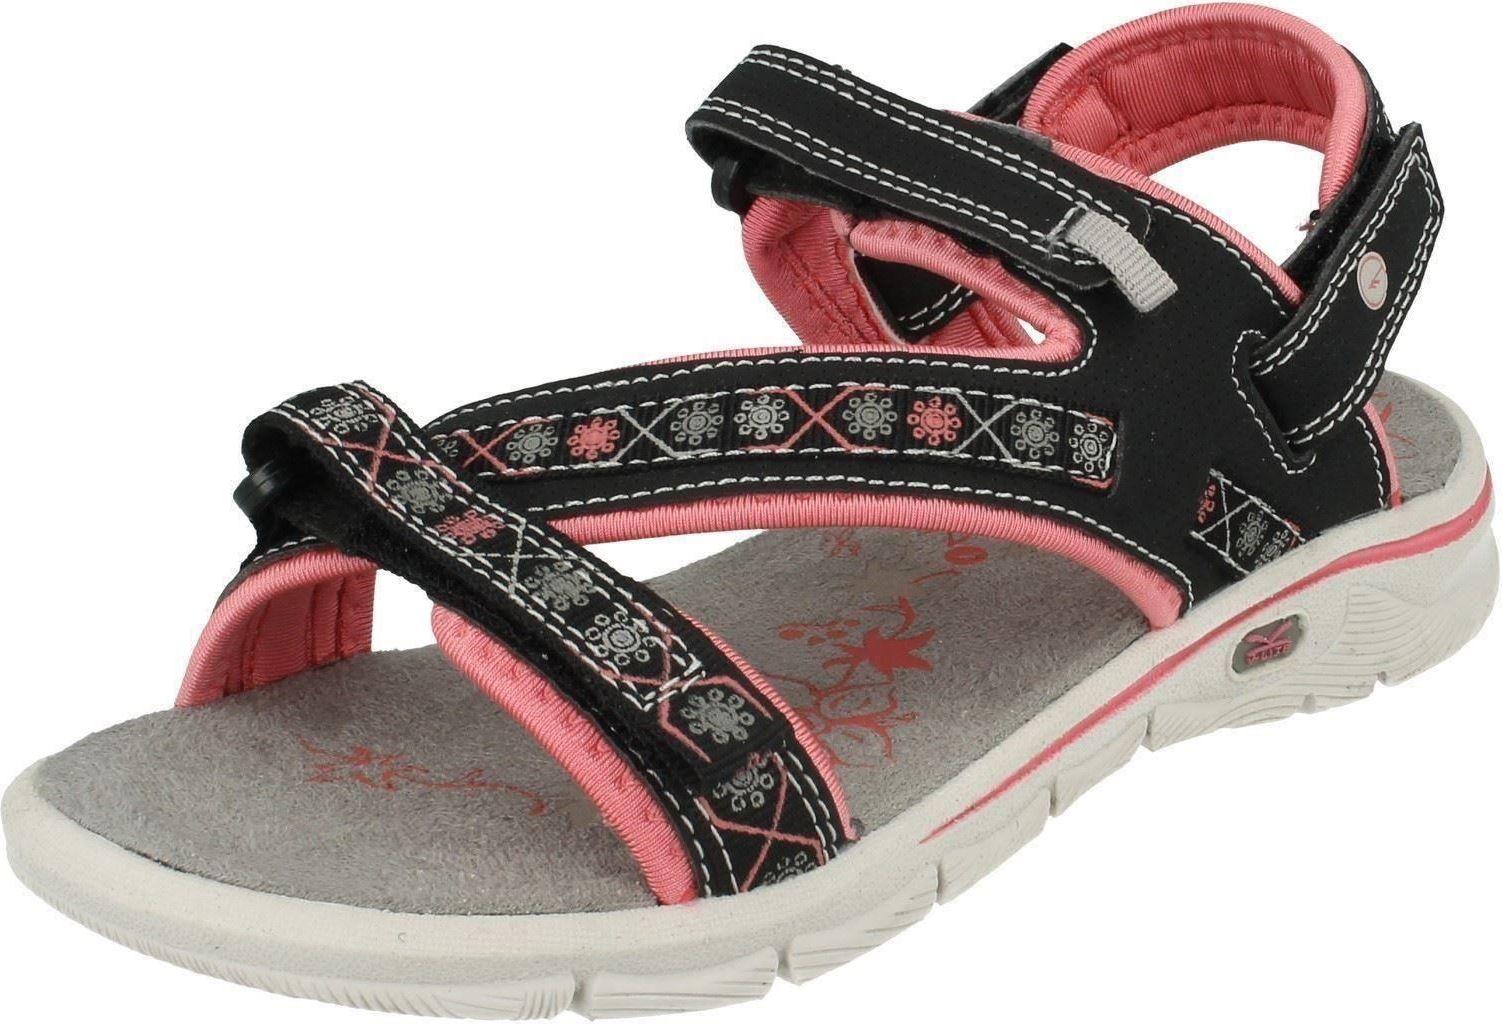 Hi-tec Women's sandals Soul-Riderz Life black and pink size 37